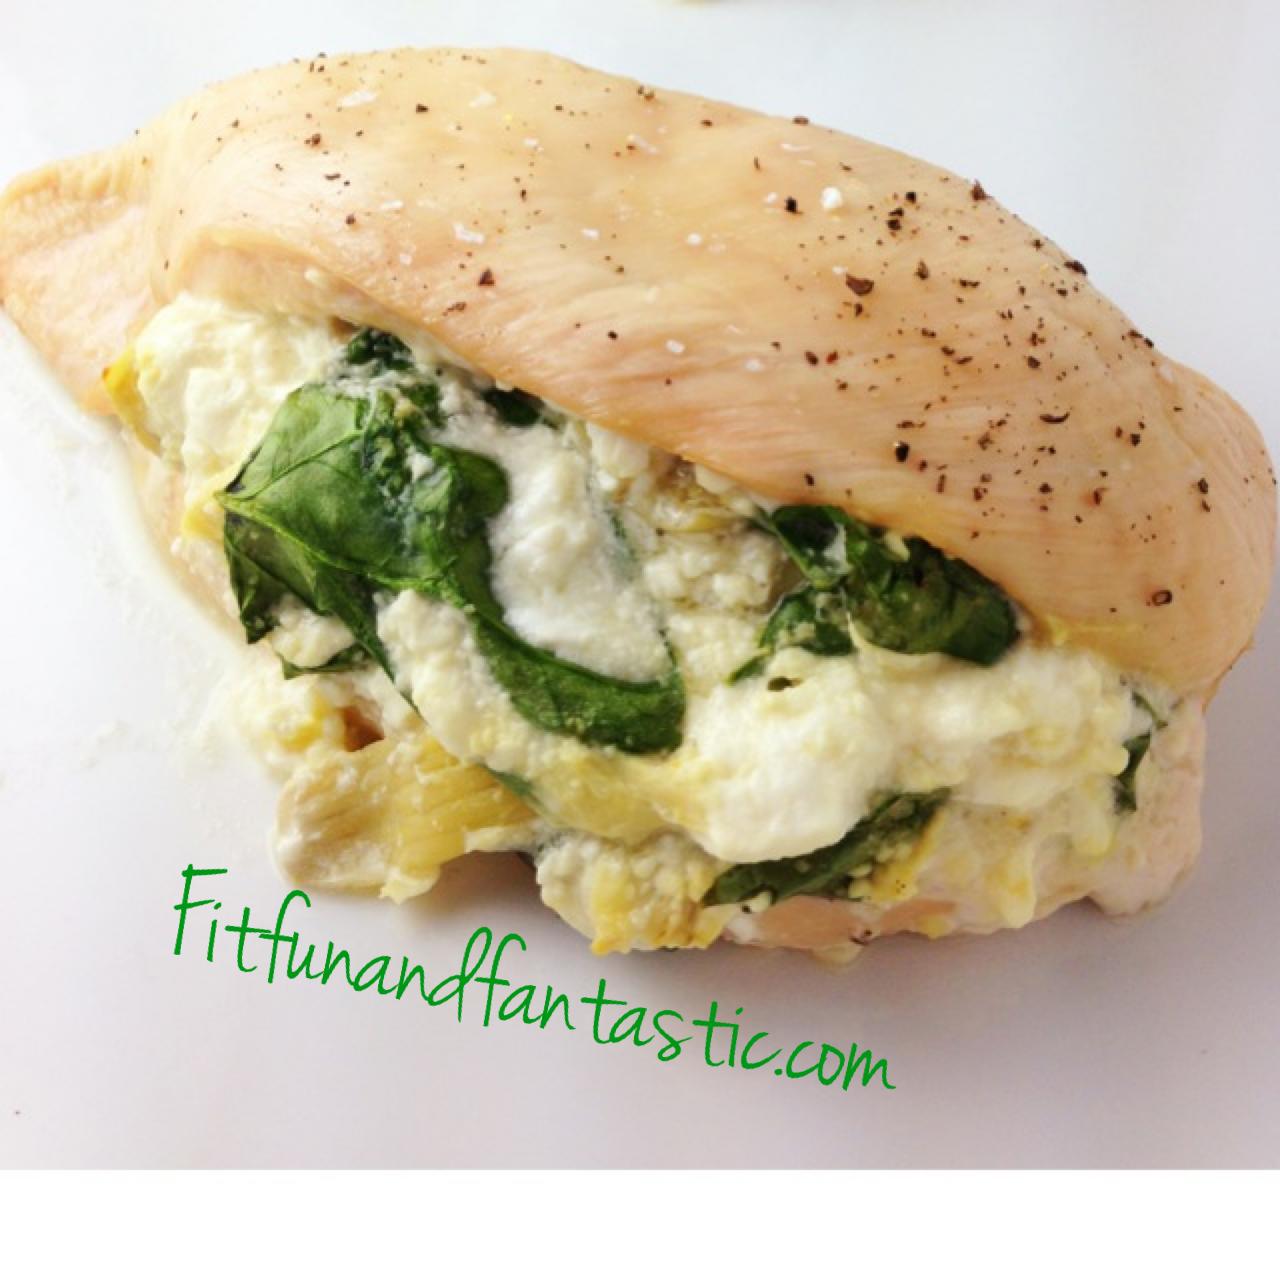 Fantastically Fit | Spinach Artichoke Stuffed Chicken